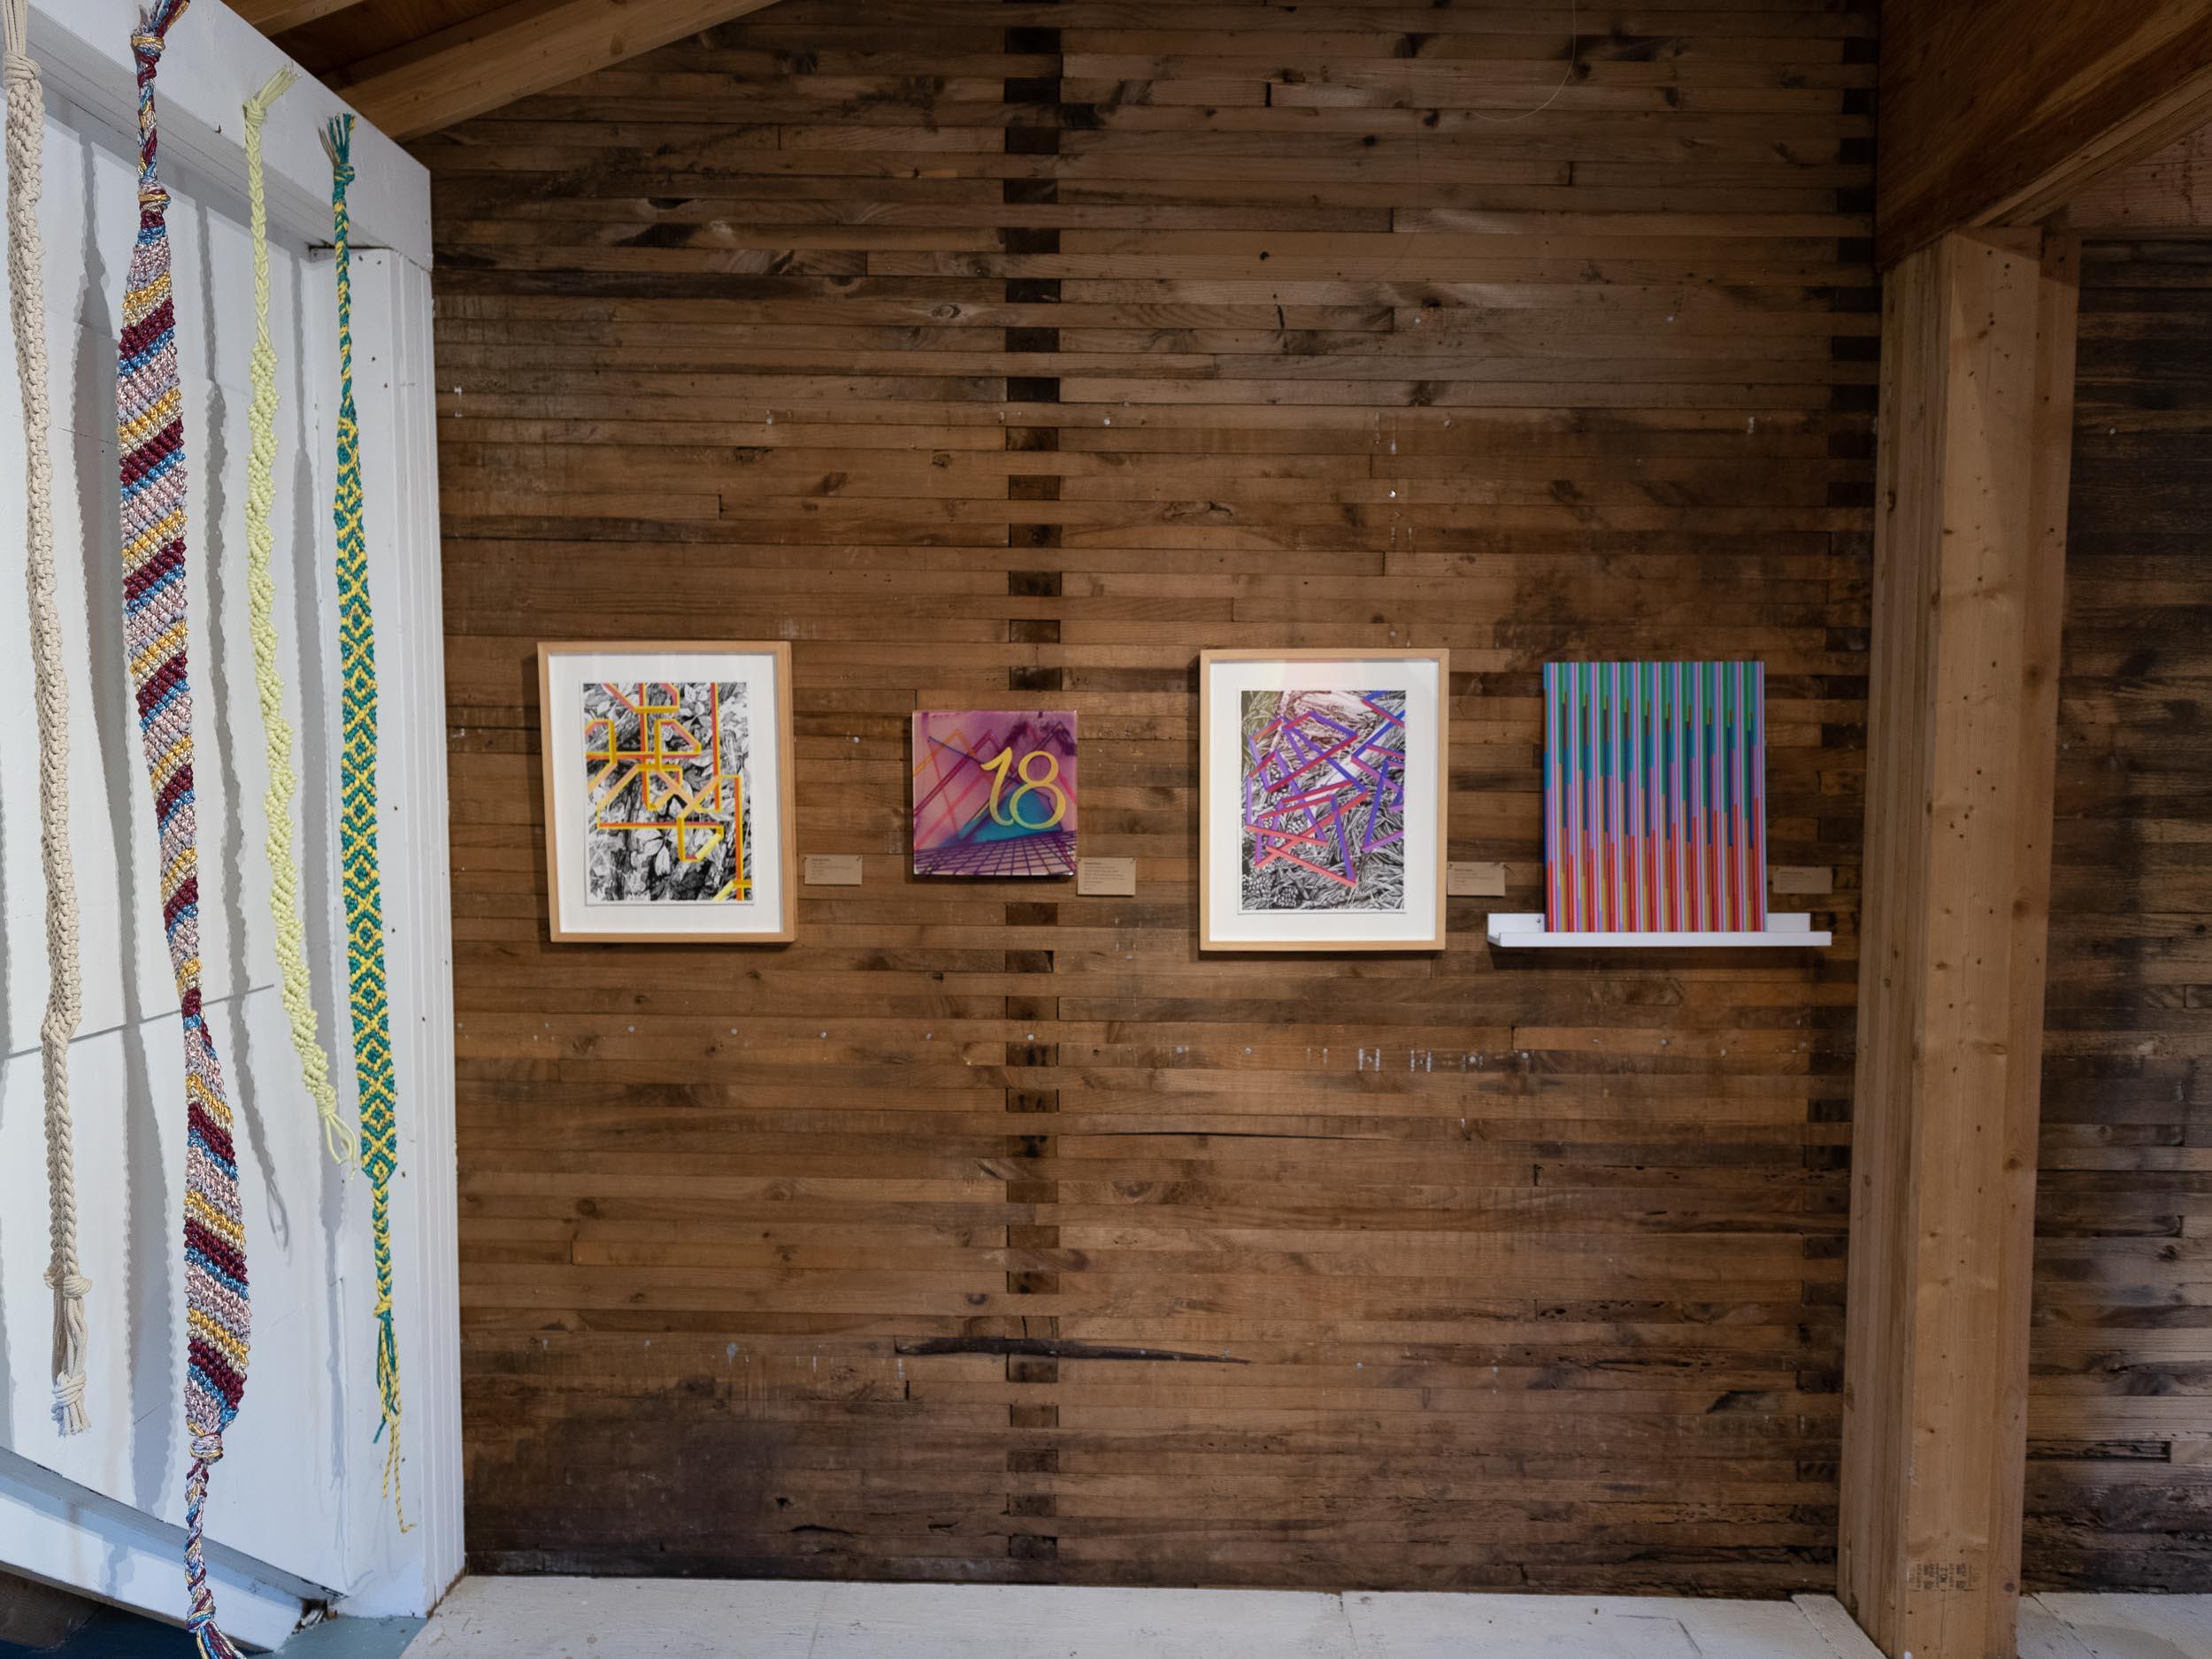 wassaic-project-summer-exhibition-ad-astra-per-aspera-installation-2019-05-15-14-03-28.jpg